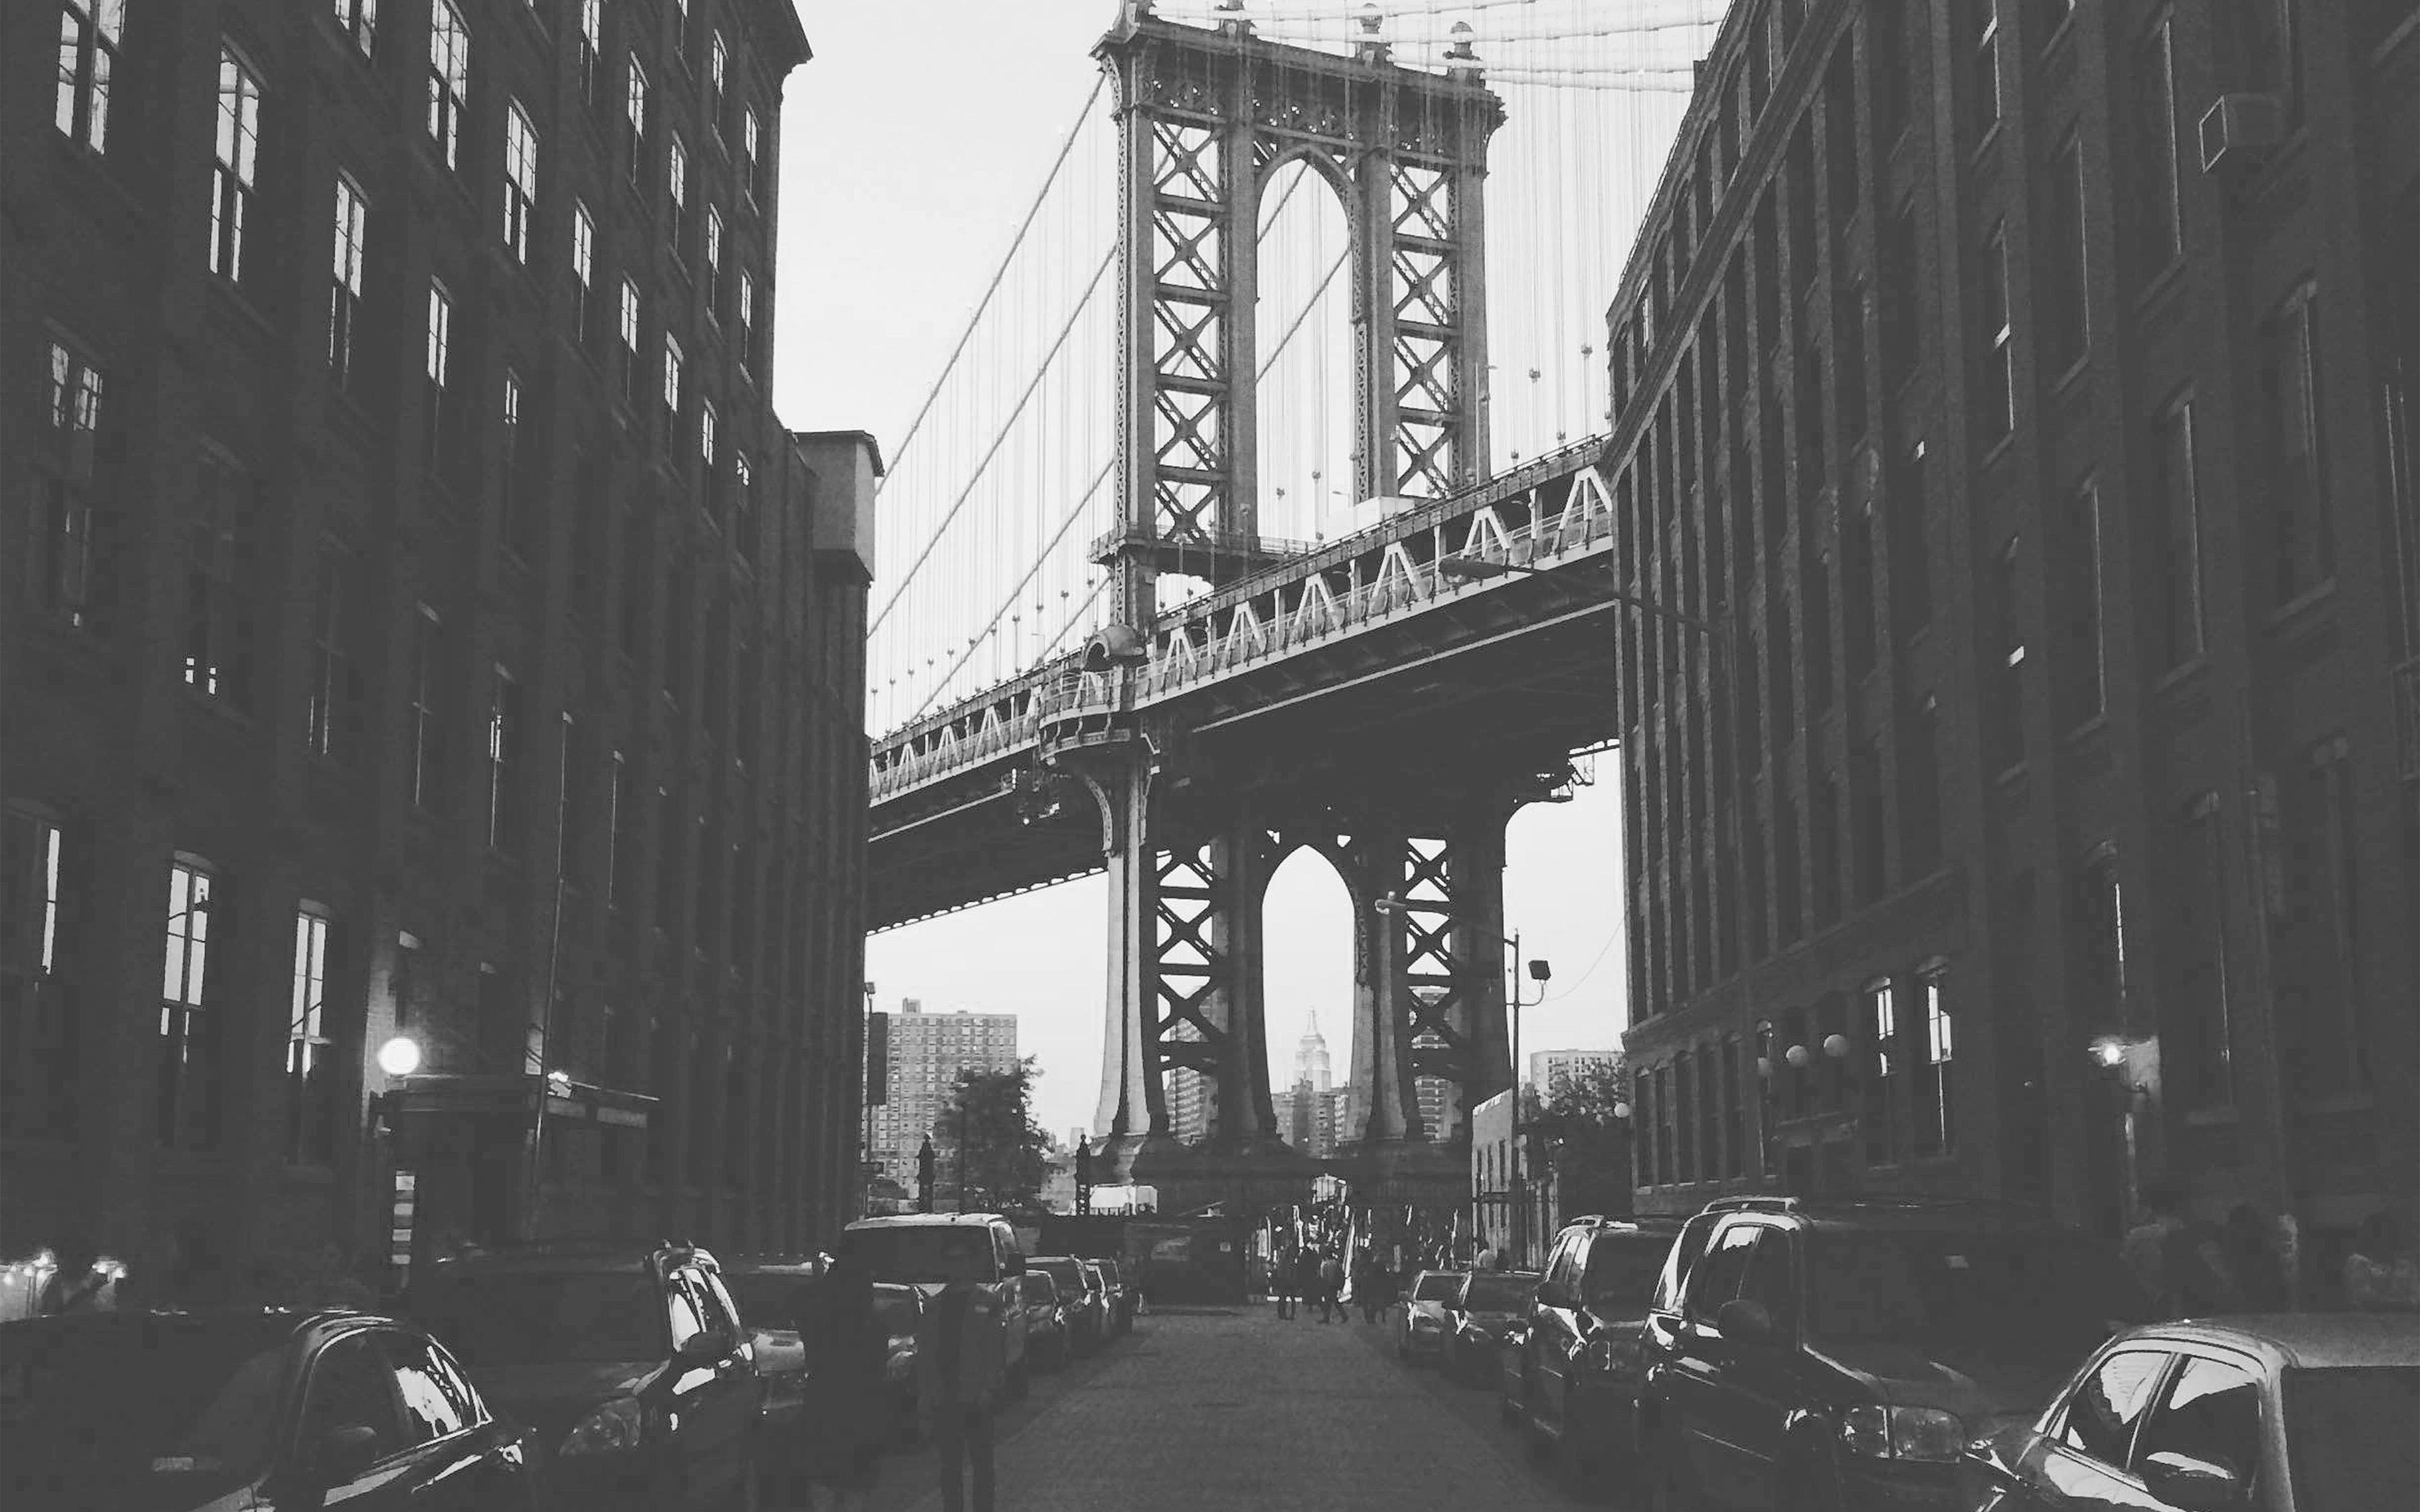 Wallpaper For Desktop Laptop Mx43 Newyork Bridge City Building Architecture Street Bw